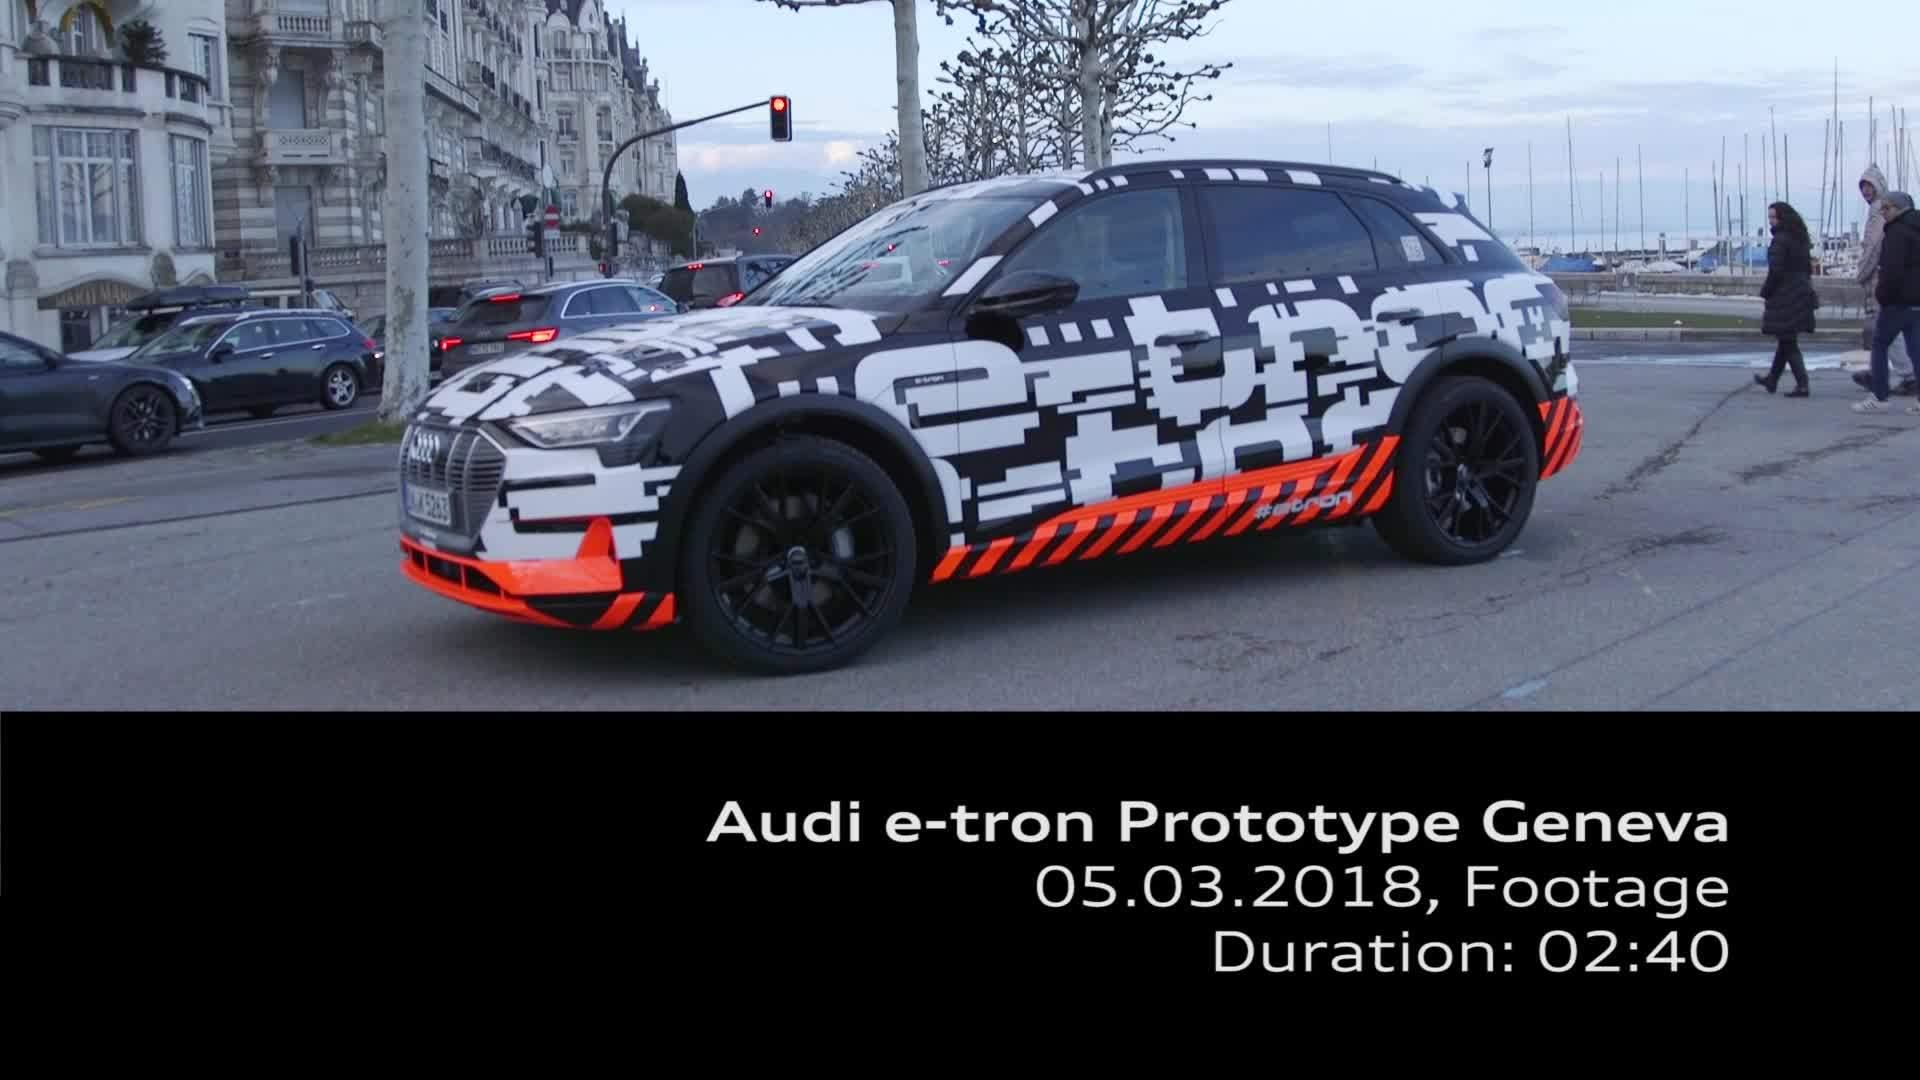 Footage Audi e-tron prototype